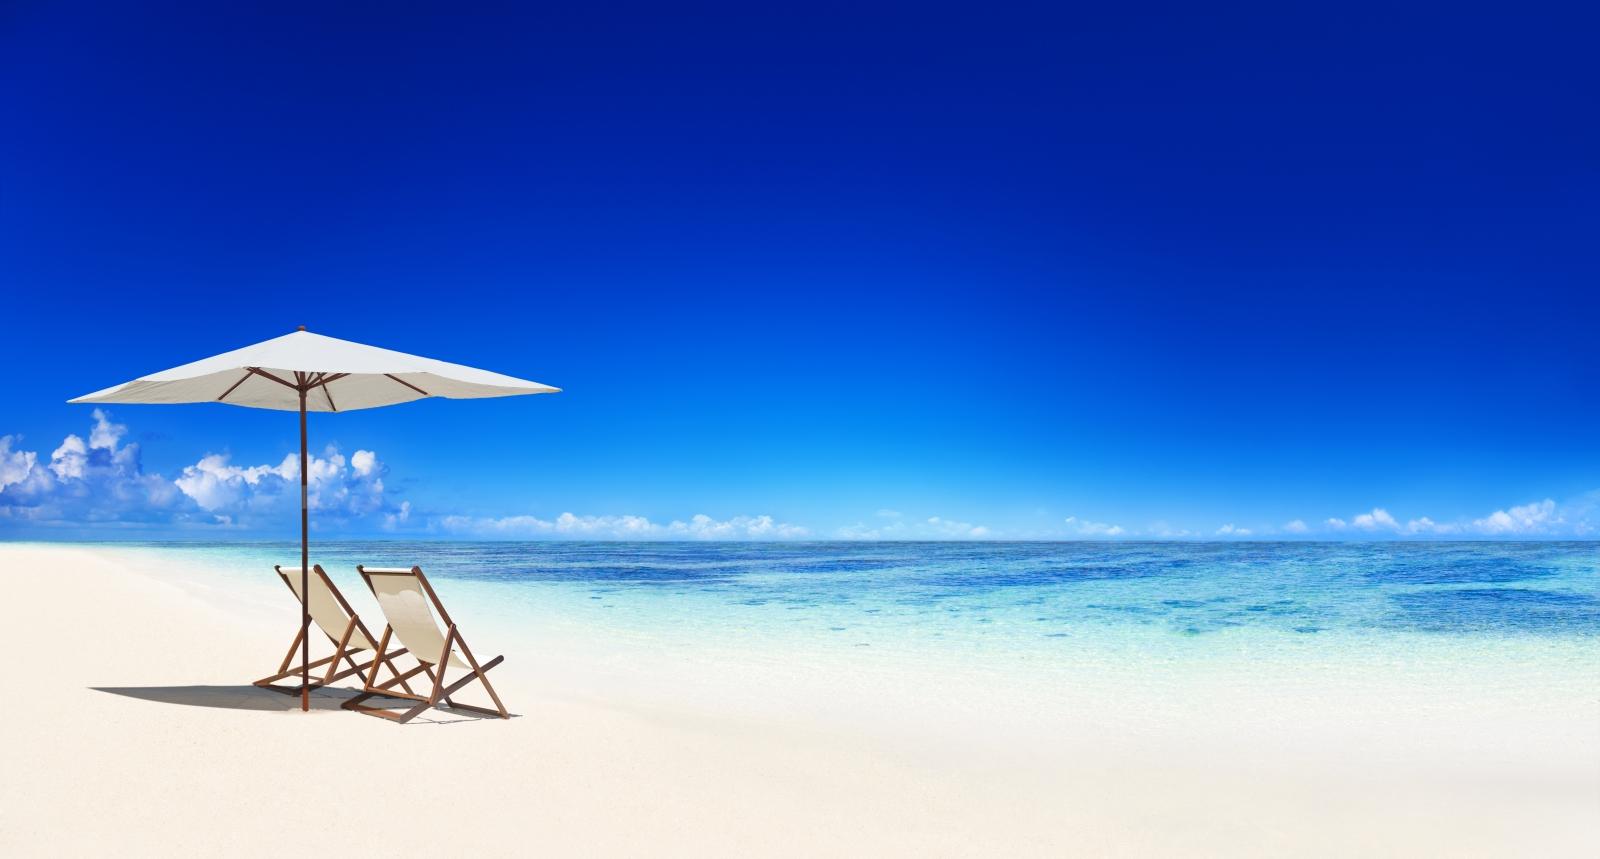 Deck chair on the tropical beach.